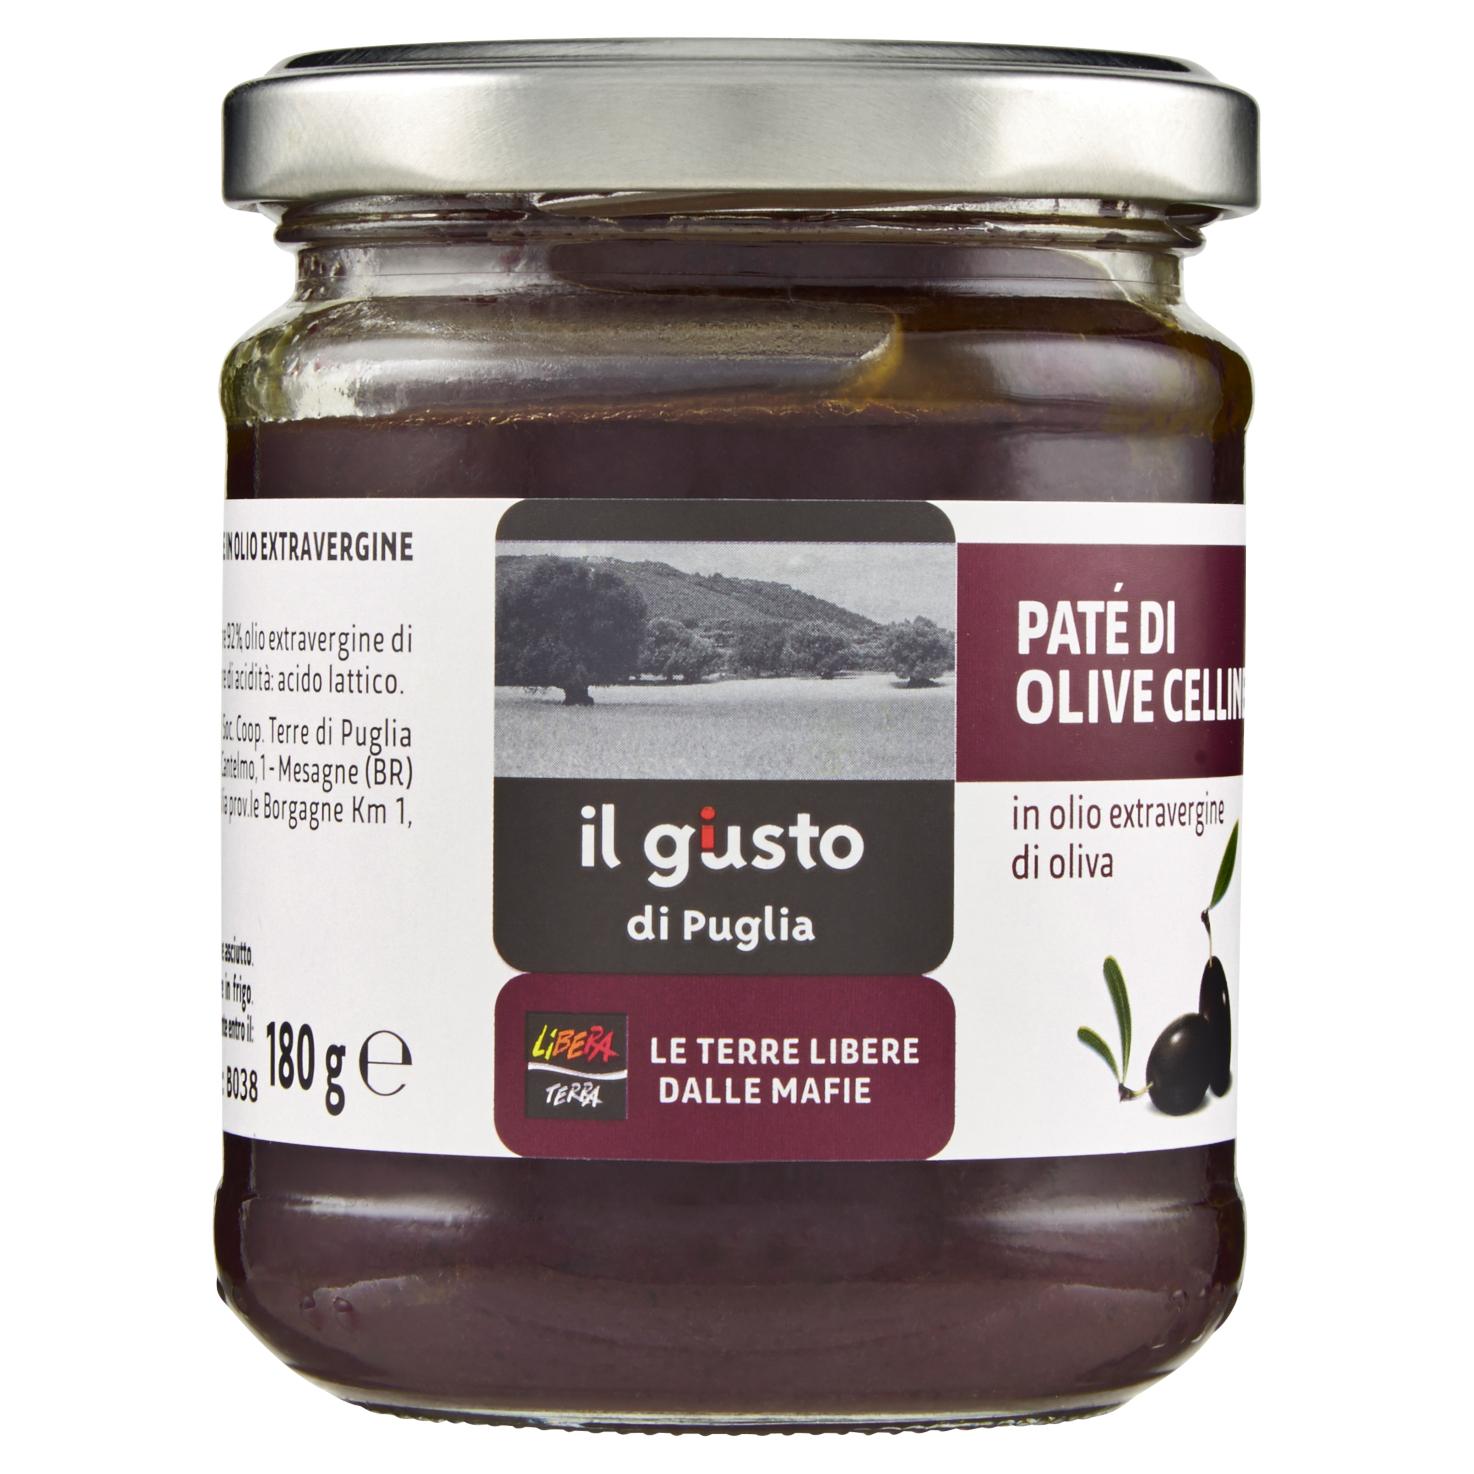 Paté Di Olive Celline 180g